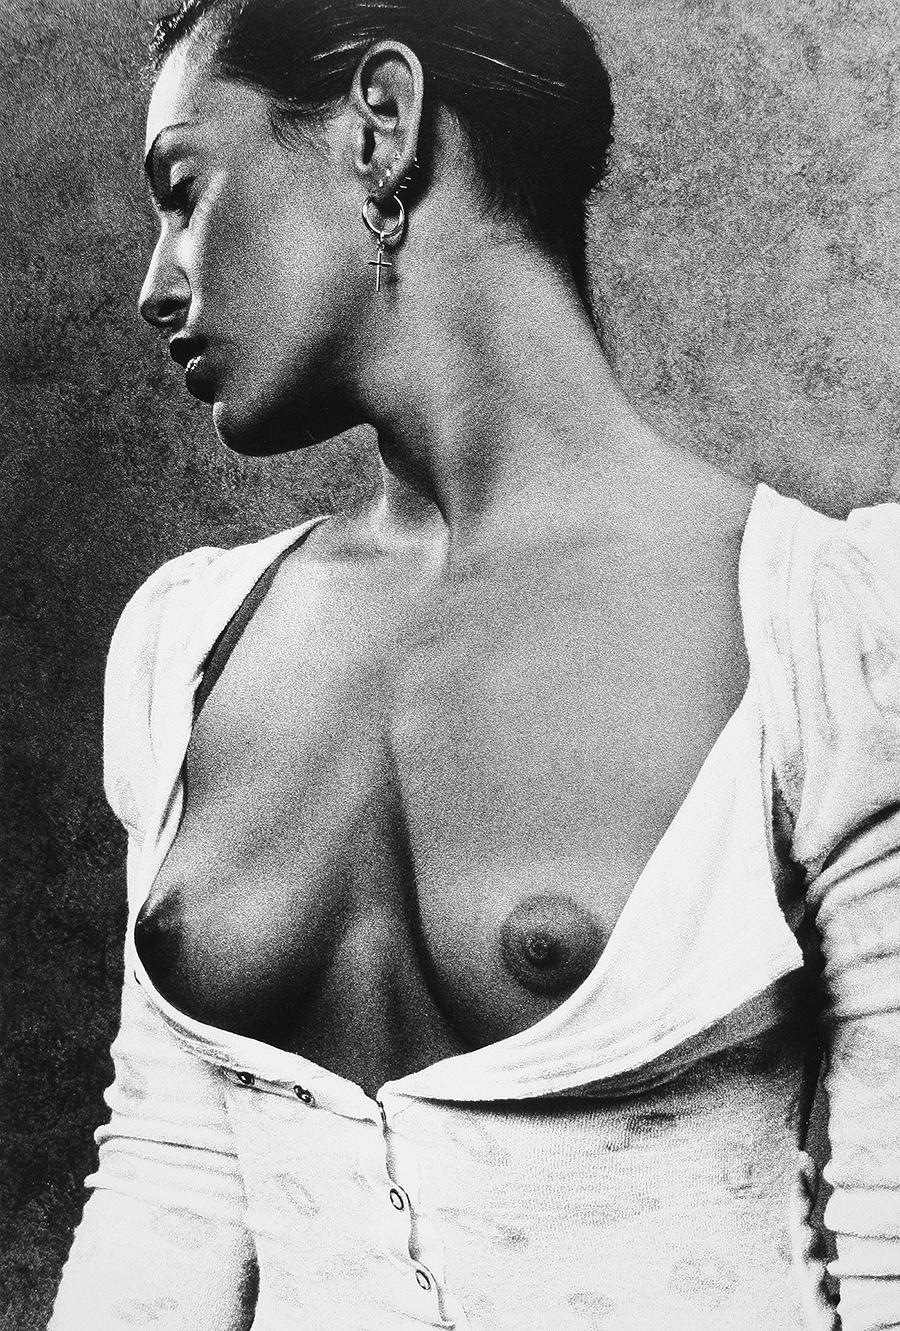 Tony_Ward_Studio_early_work_casting_calls_black_white_model_topless_unbottened_dress_cross_earrings